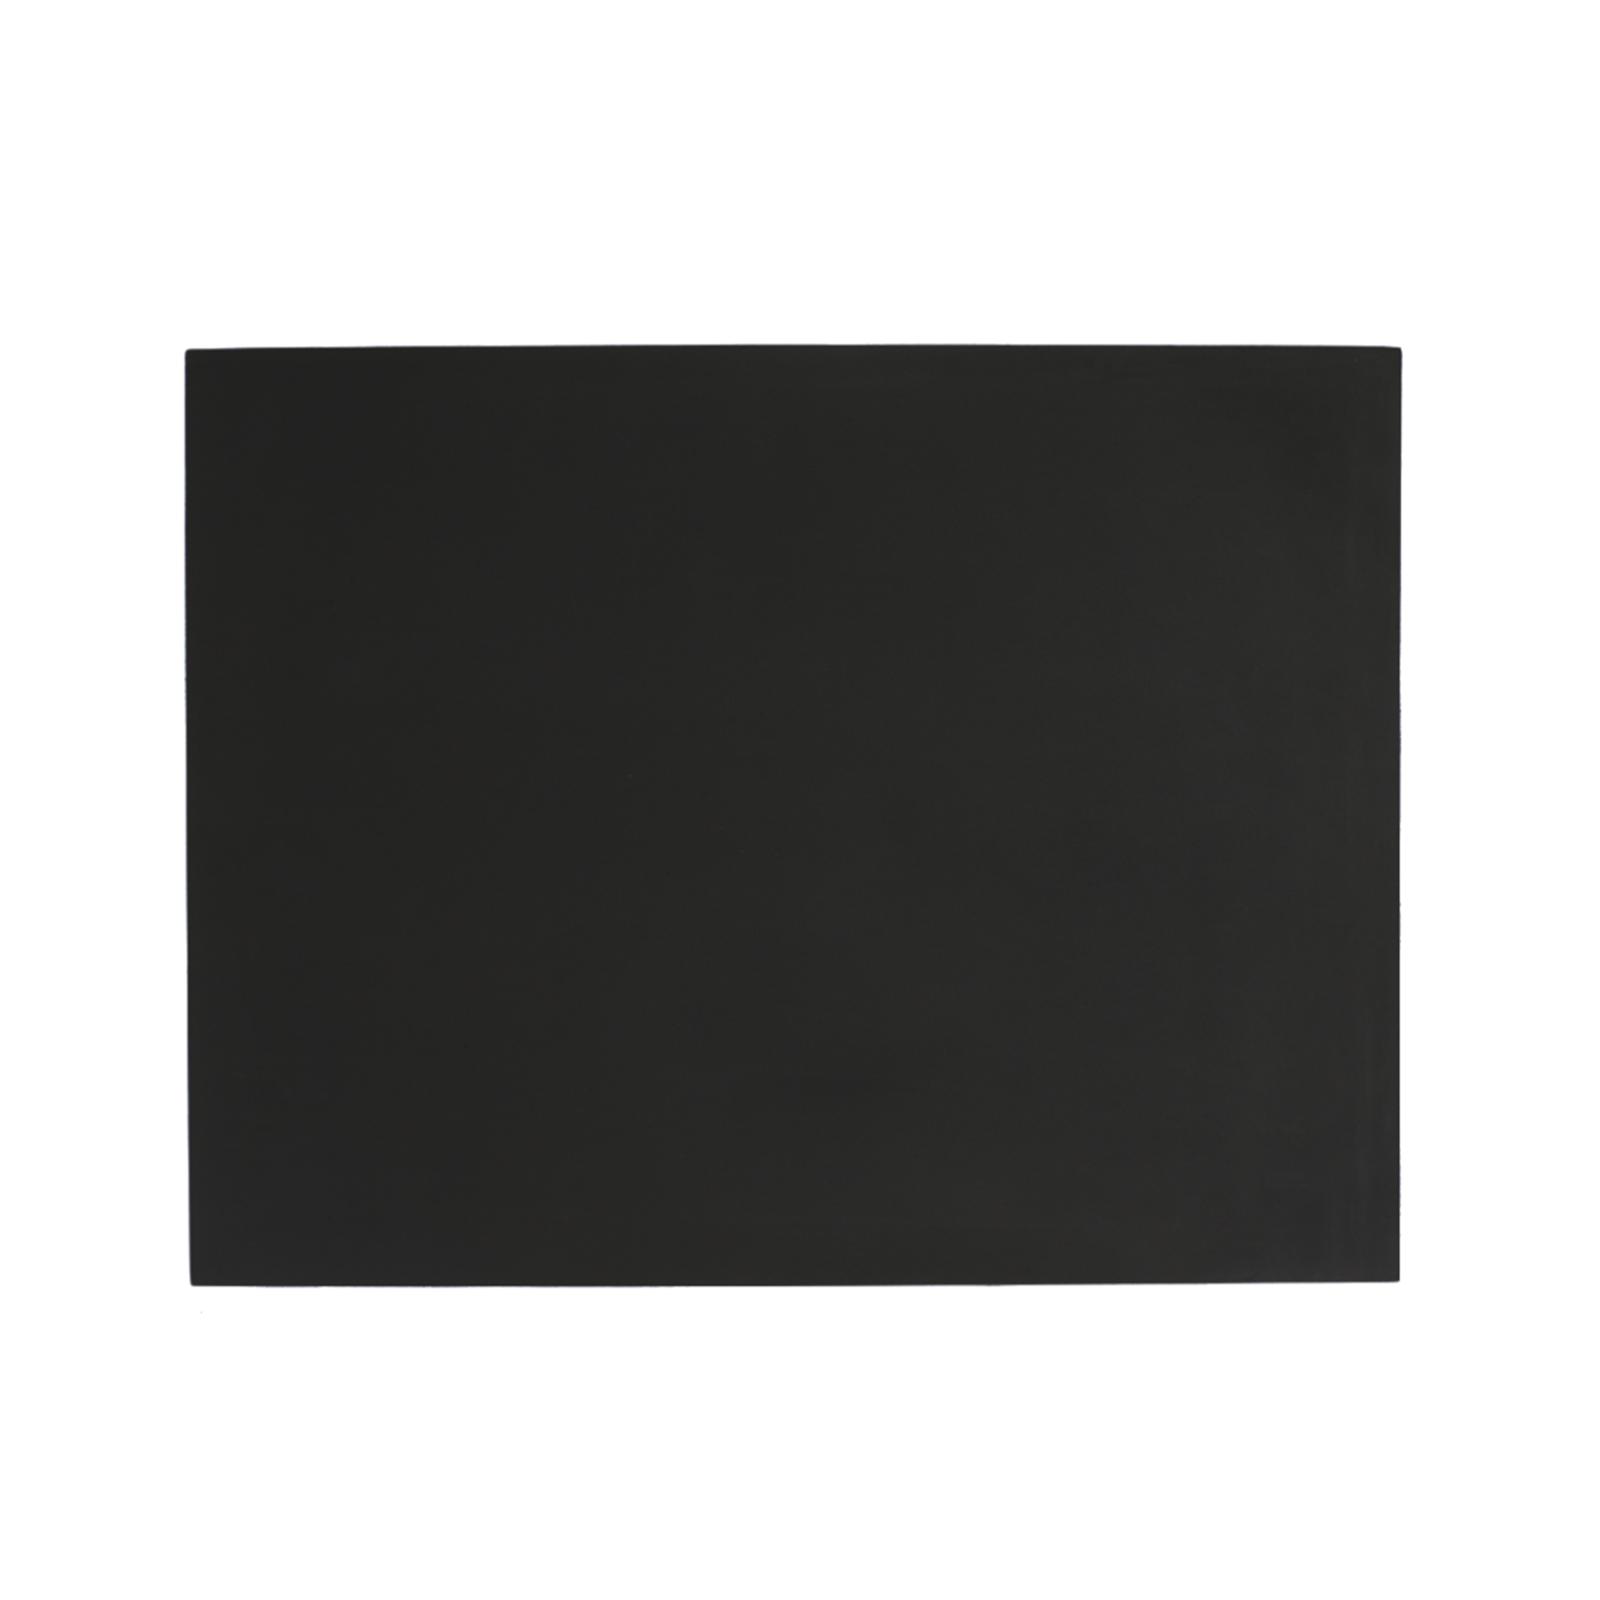 SEJ Design – Dækkeserviet Rektangulær Sort – 44 x 34 cm